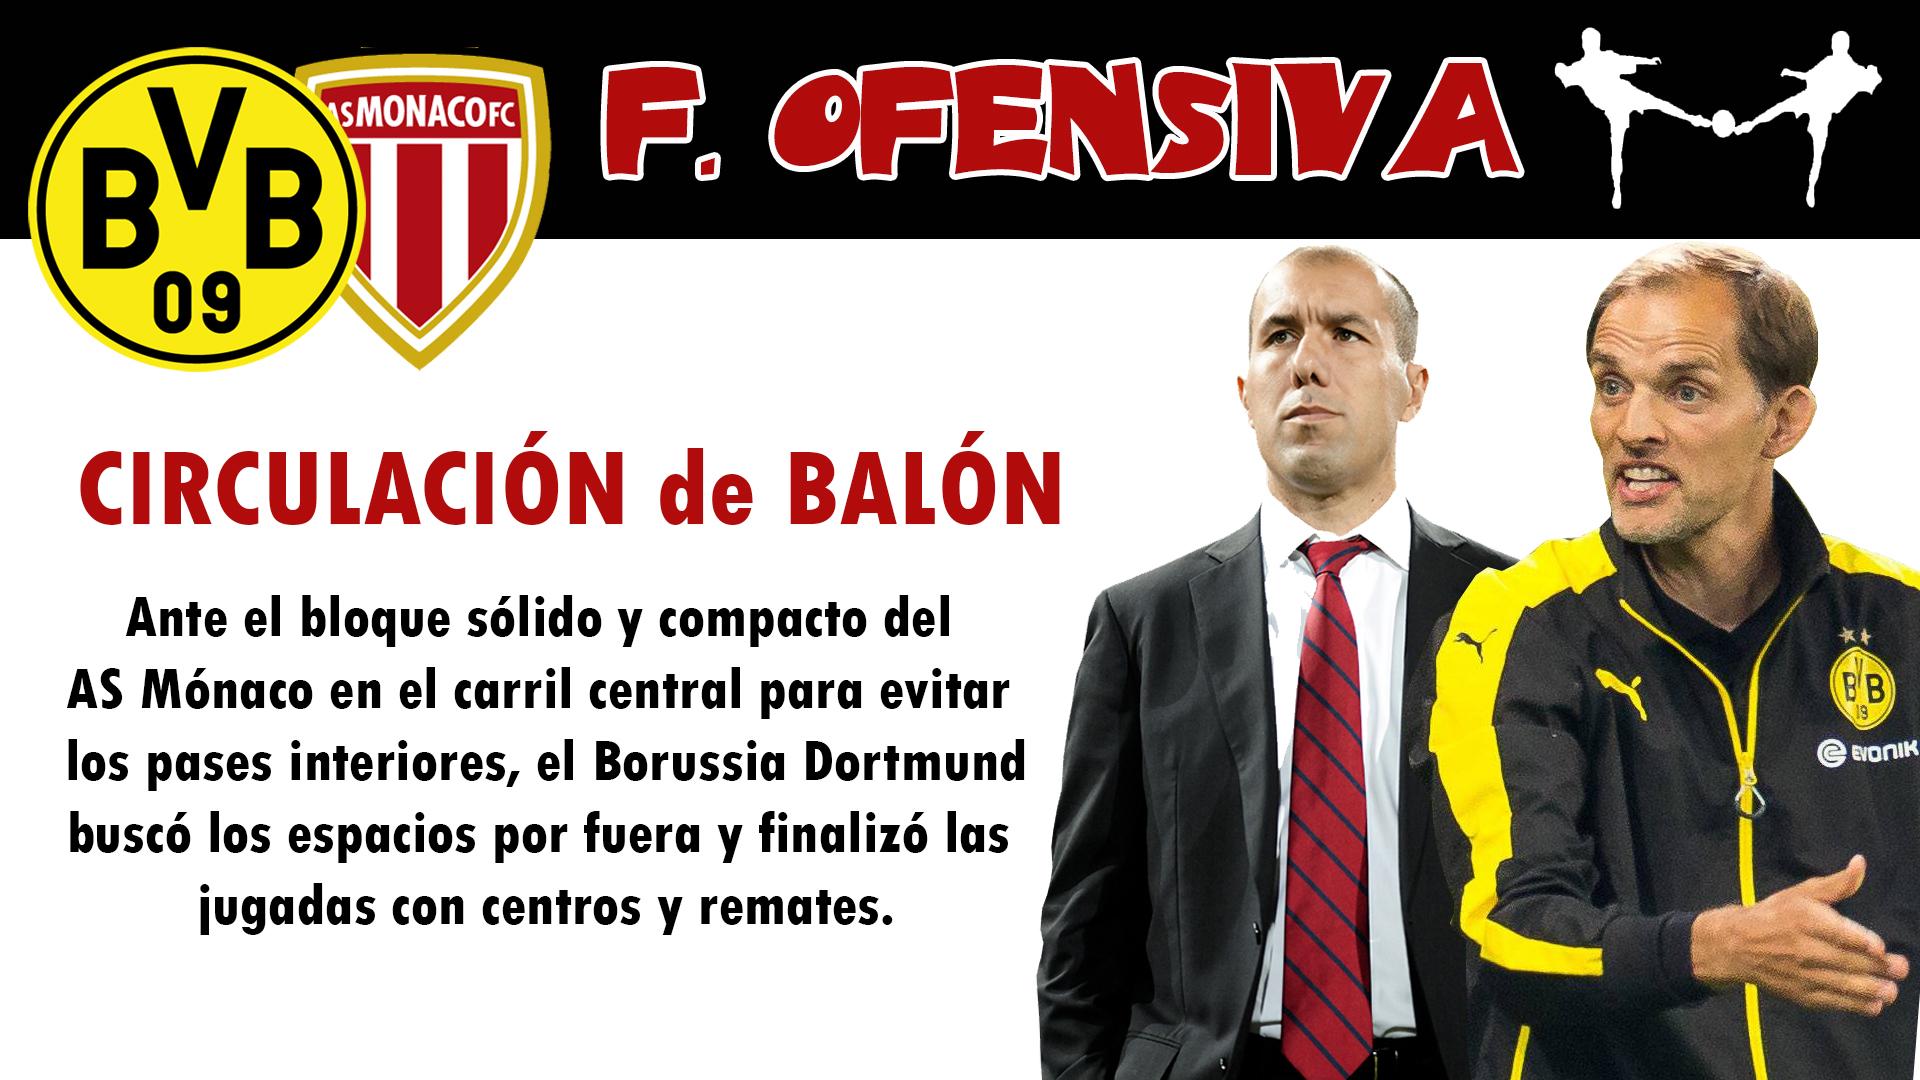 futbolcarrasco borussia dormunt champions league monaco entrenadores tuchel jardim